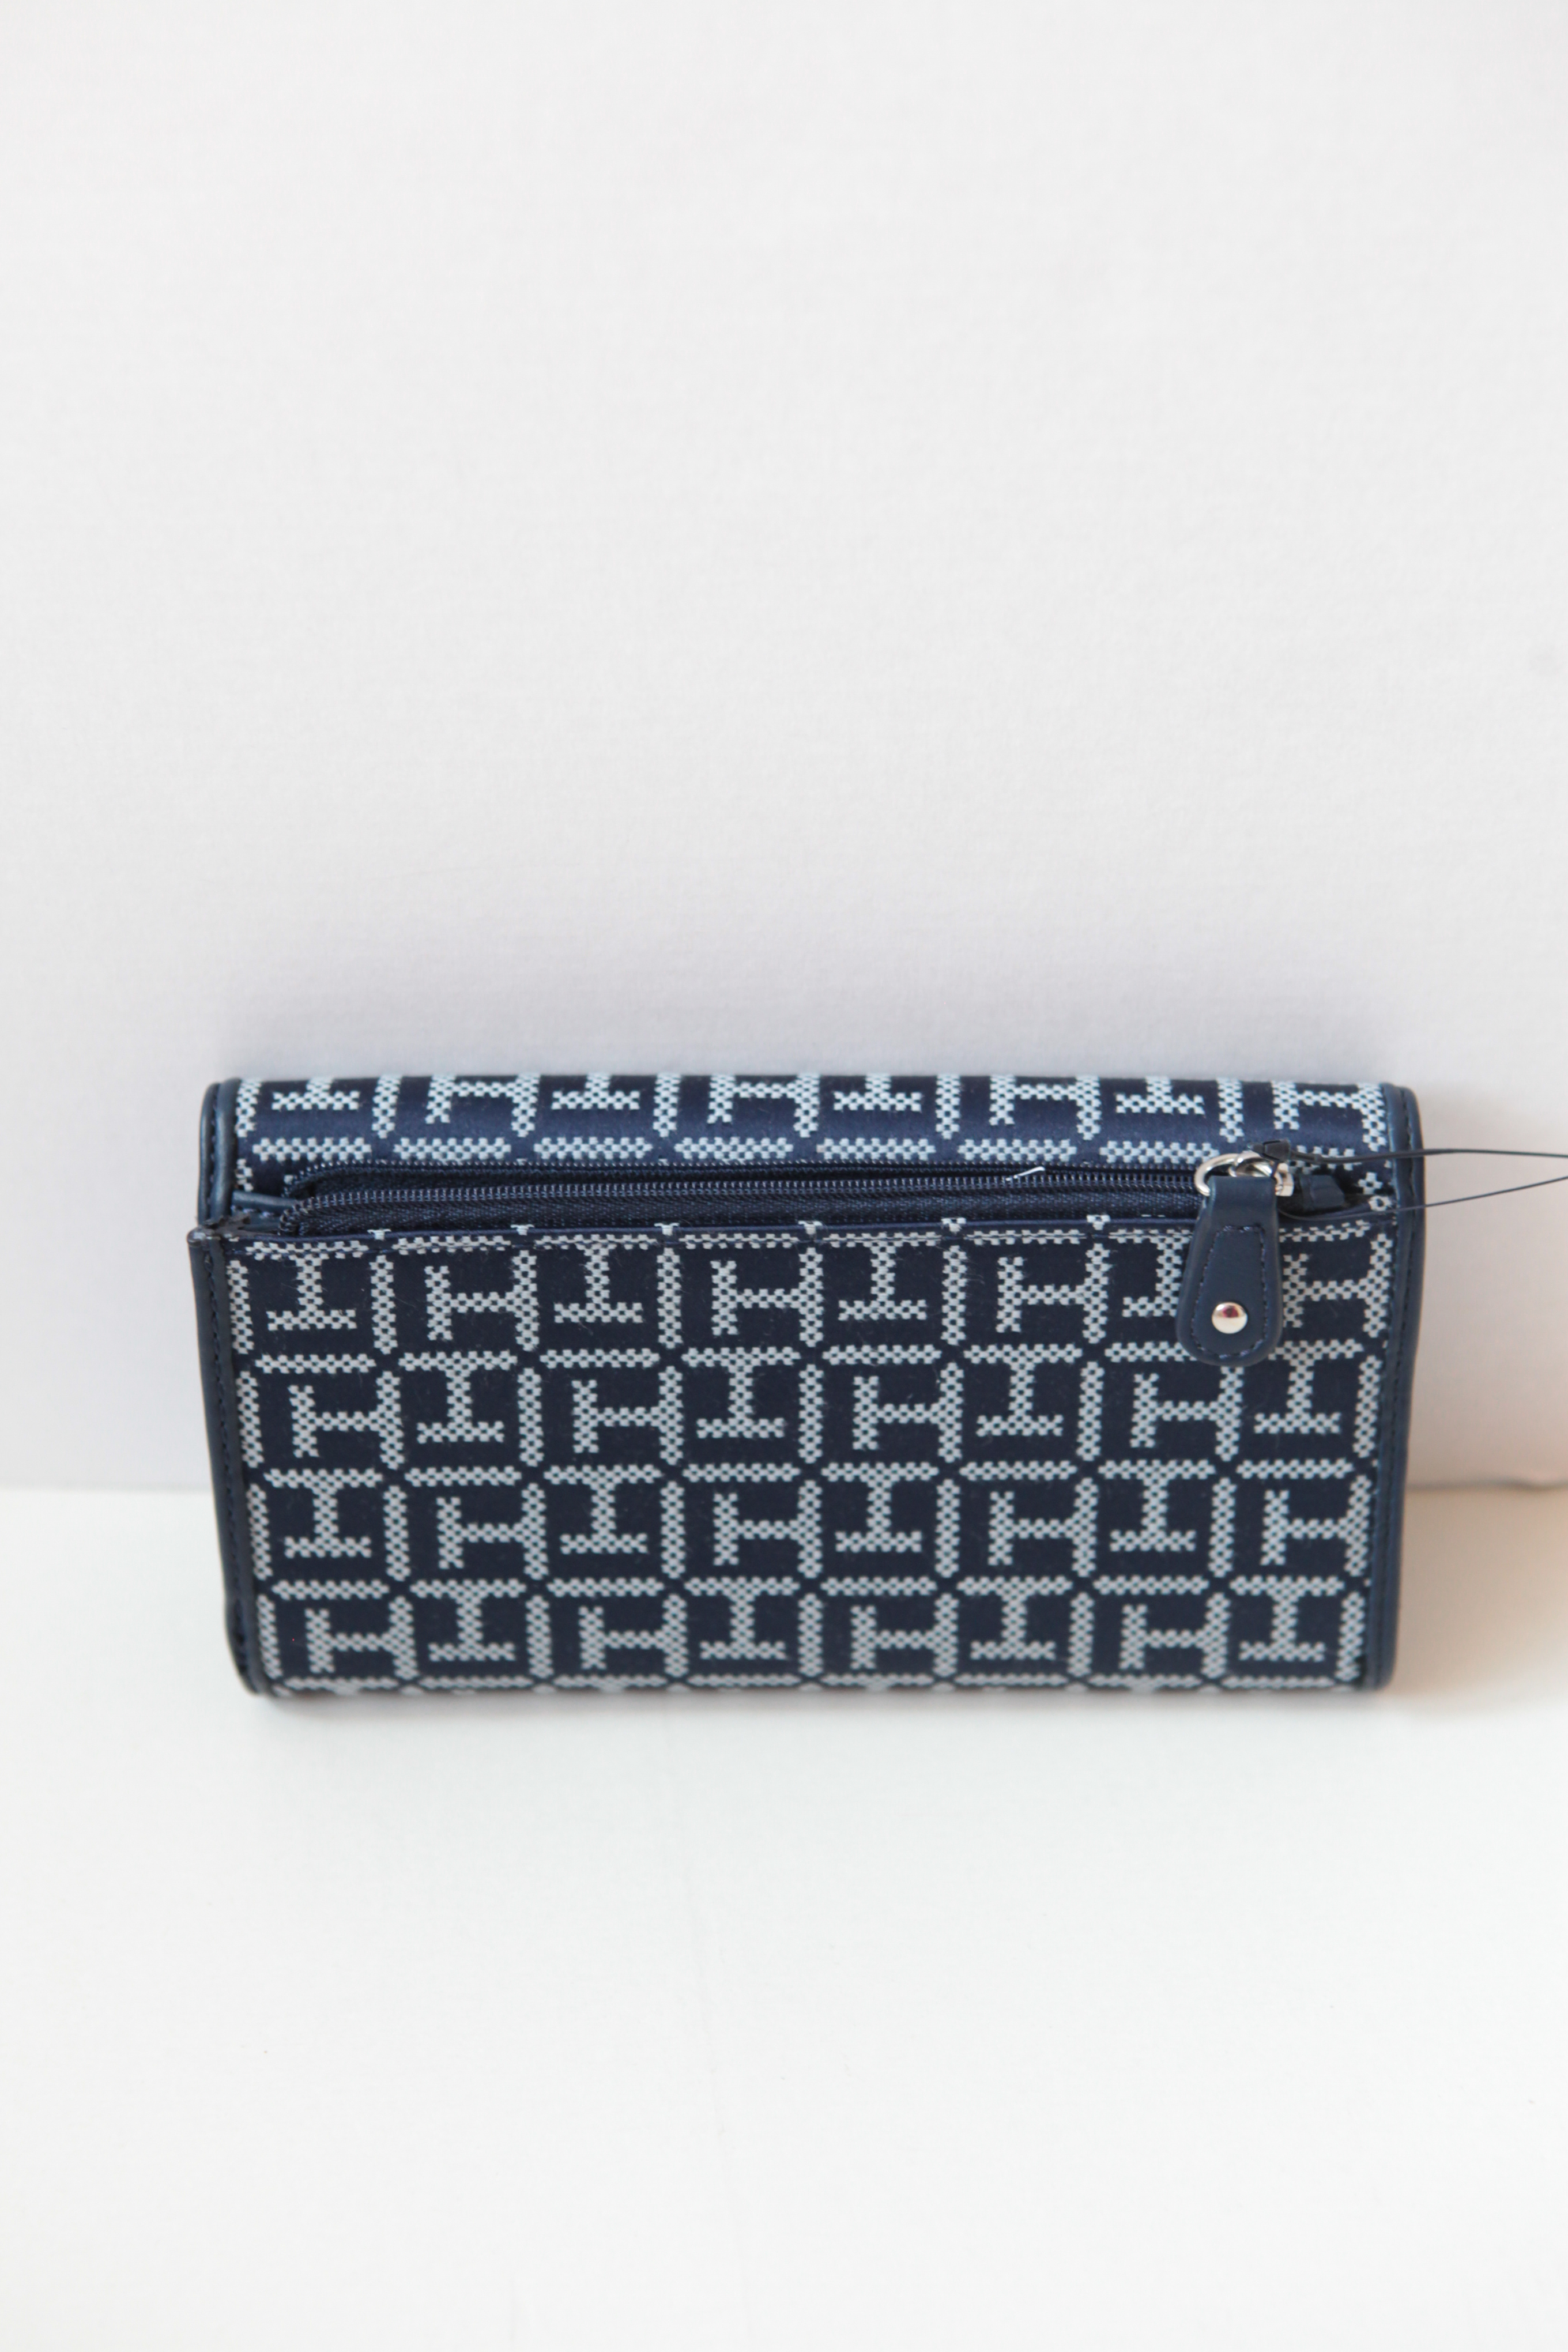 TOMMY HILFIGER peňaženka modrá. - Glami.cz 48237f412cc